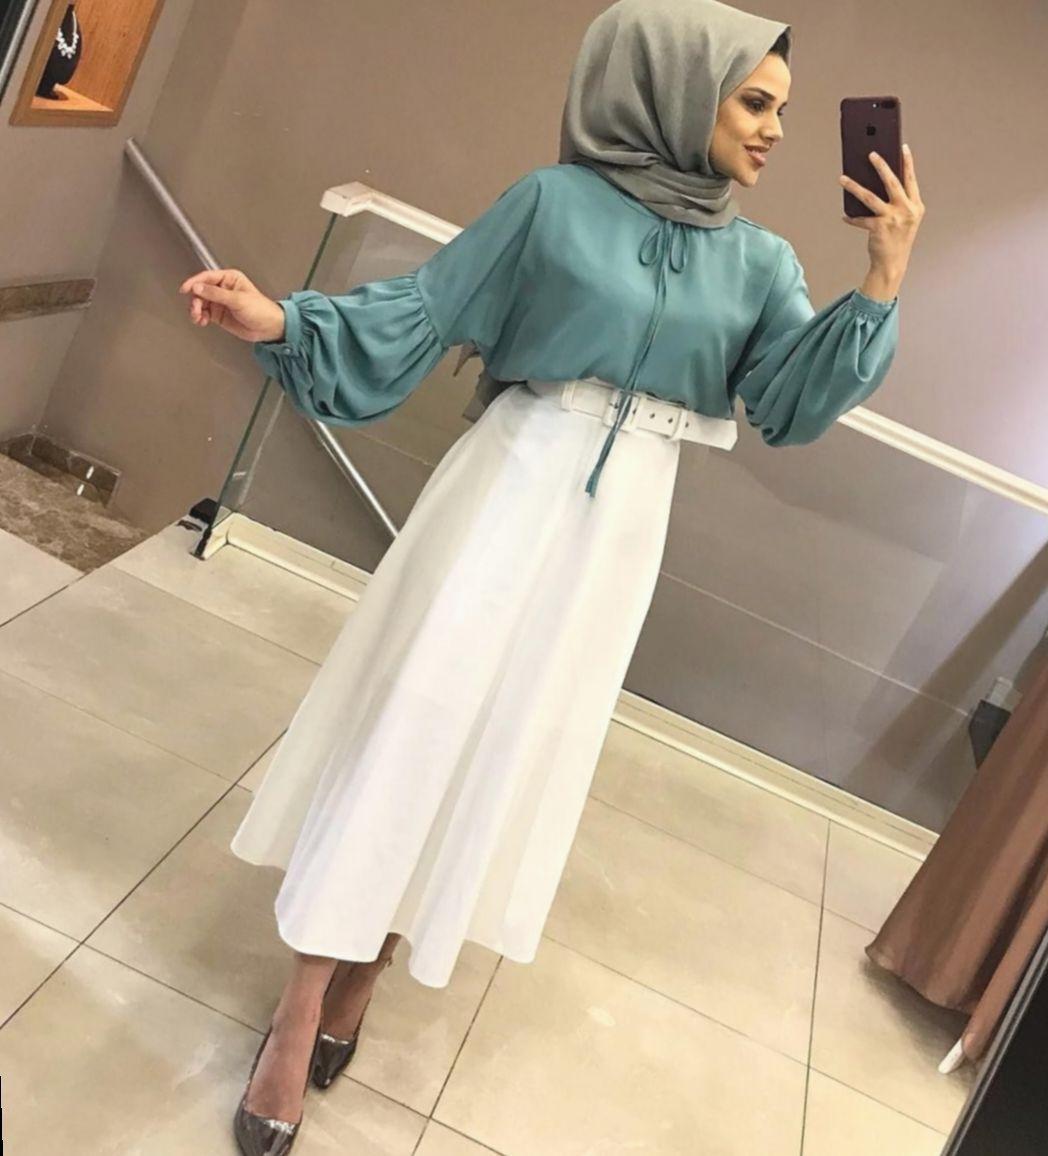 ✔ Fashion Summer Hijab Maxi Dresses #style #fitness #uae#dresses #fashion #fitness #hijab #maxi #sty...